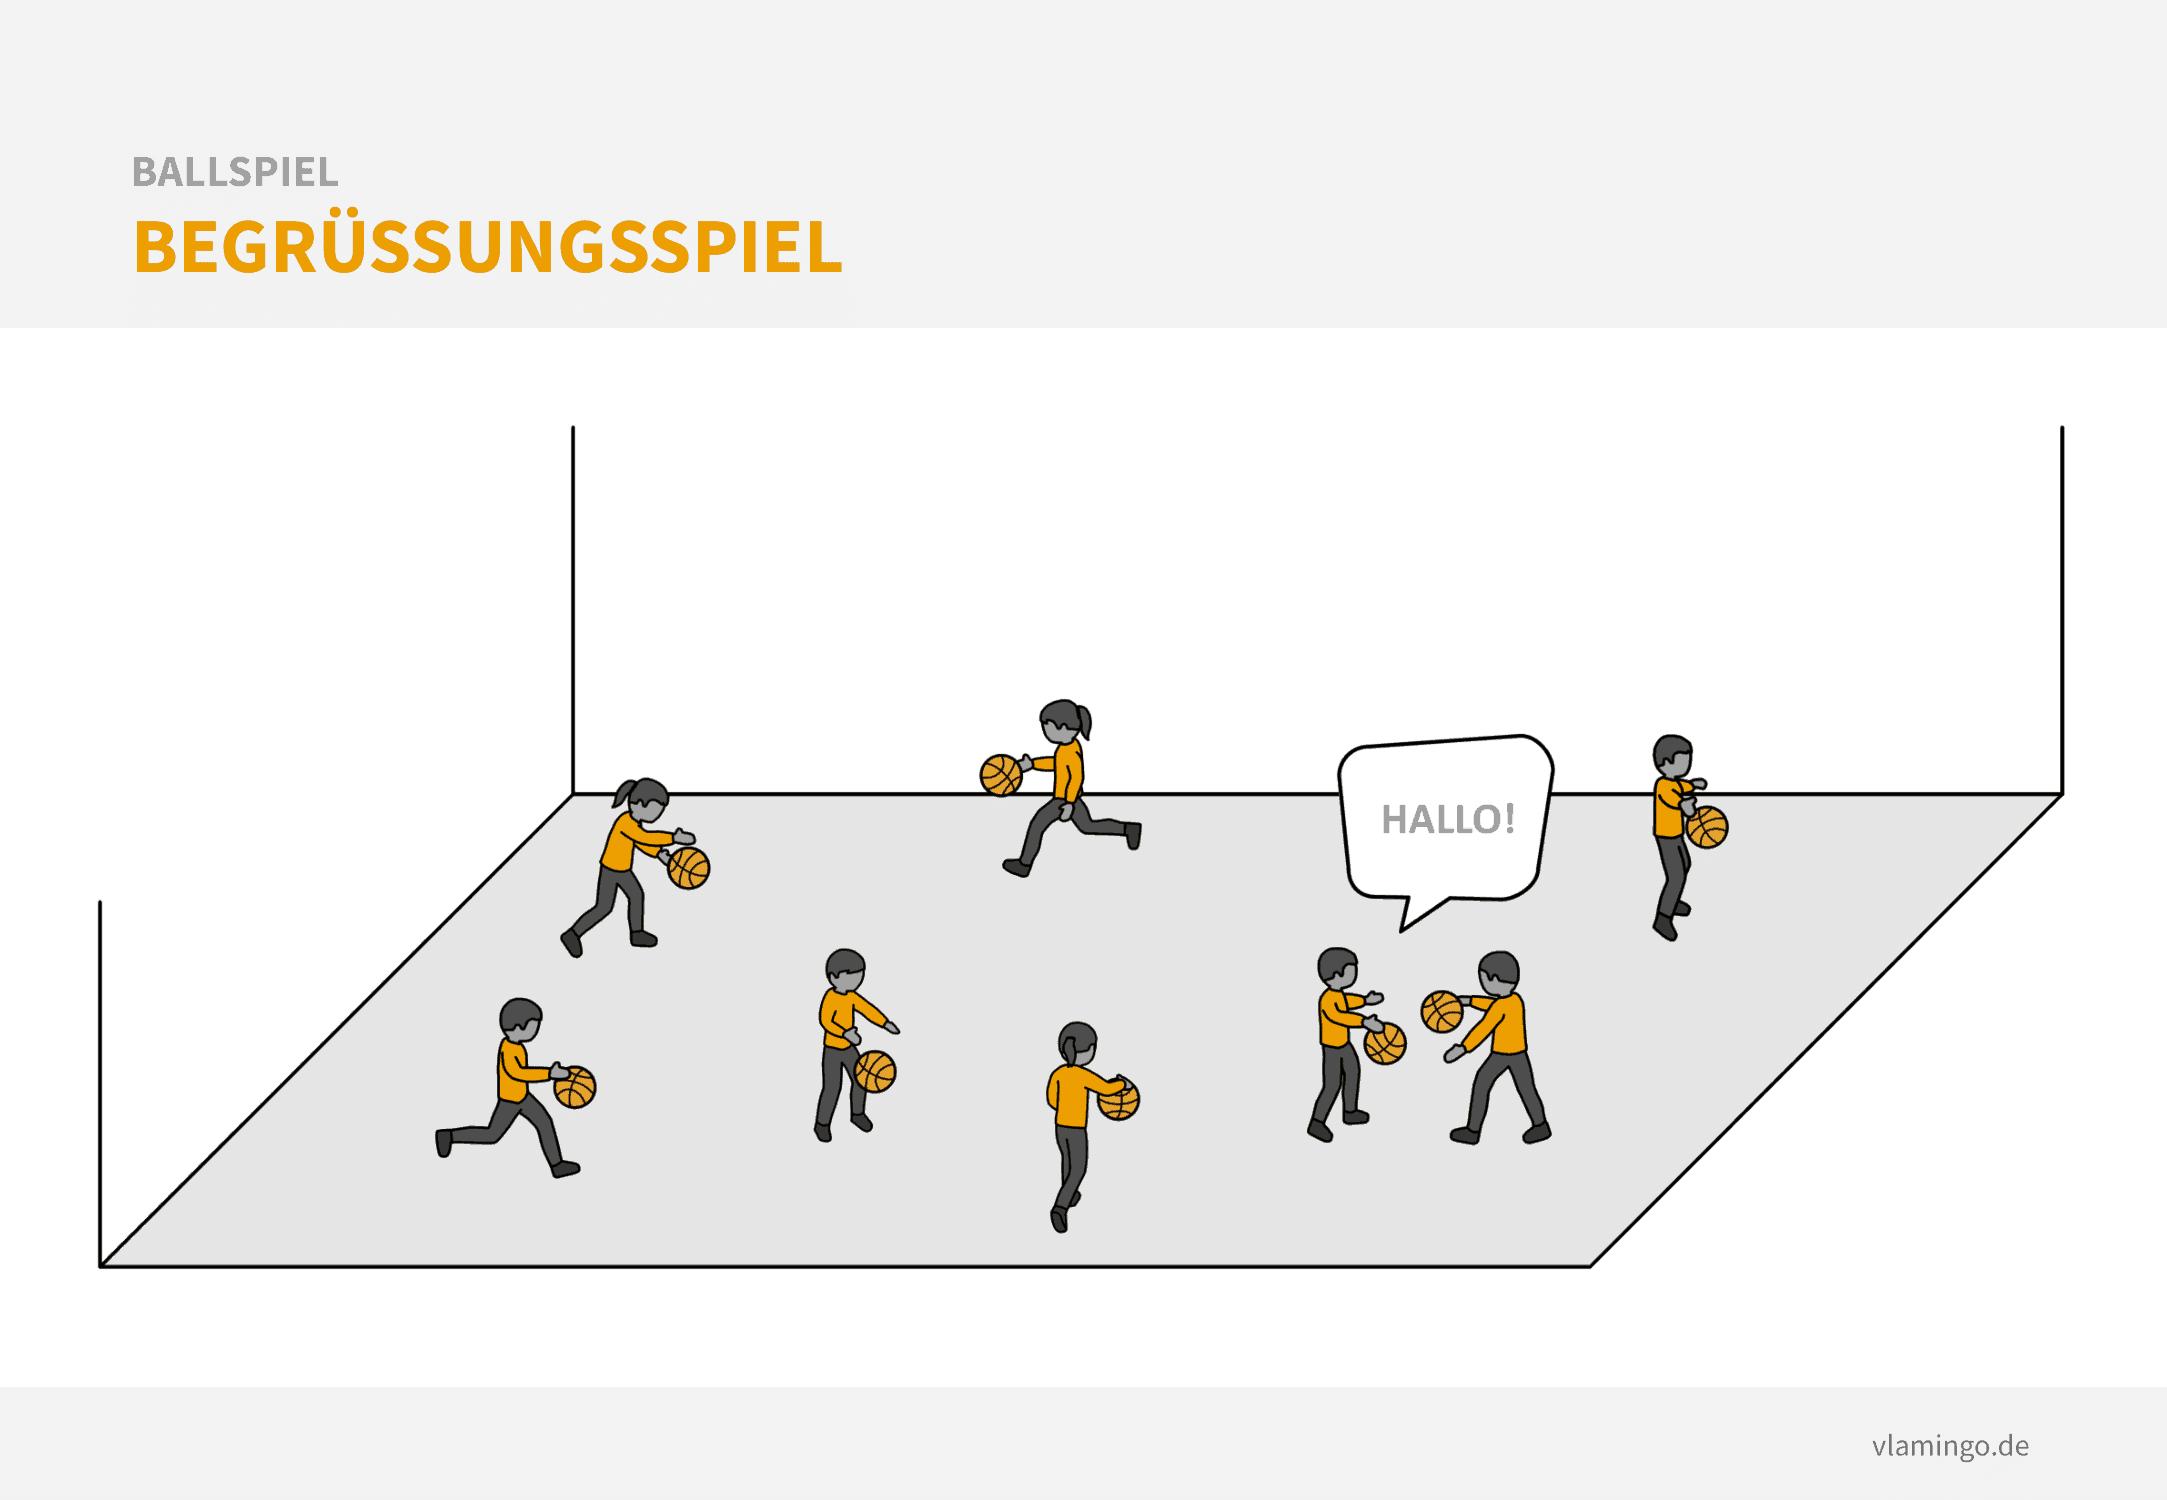 Bask. Ballspiel